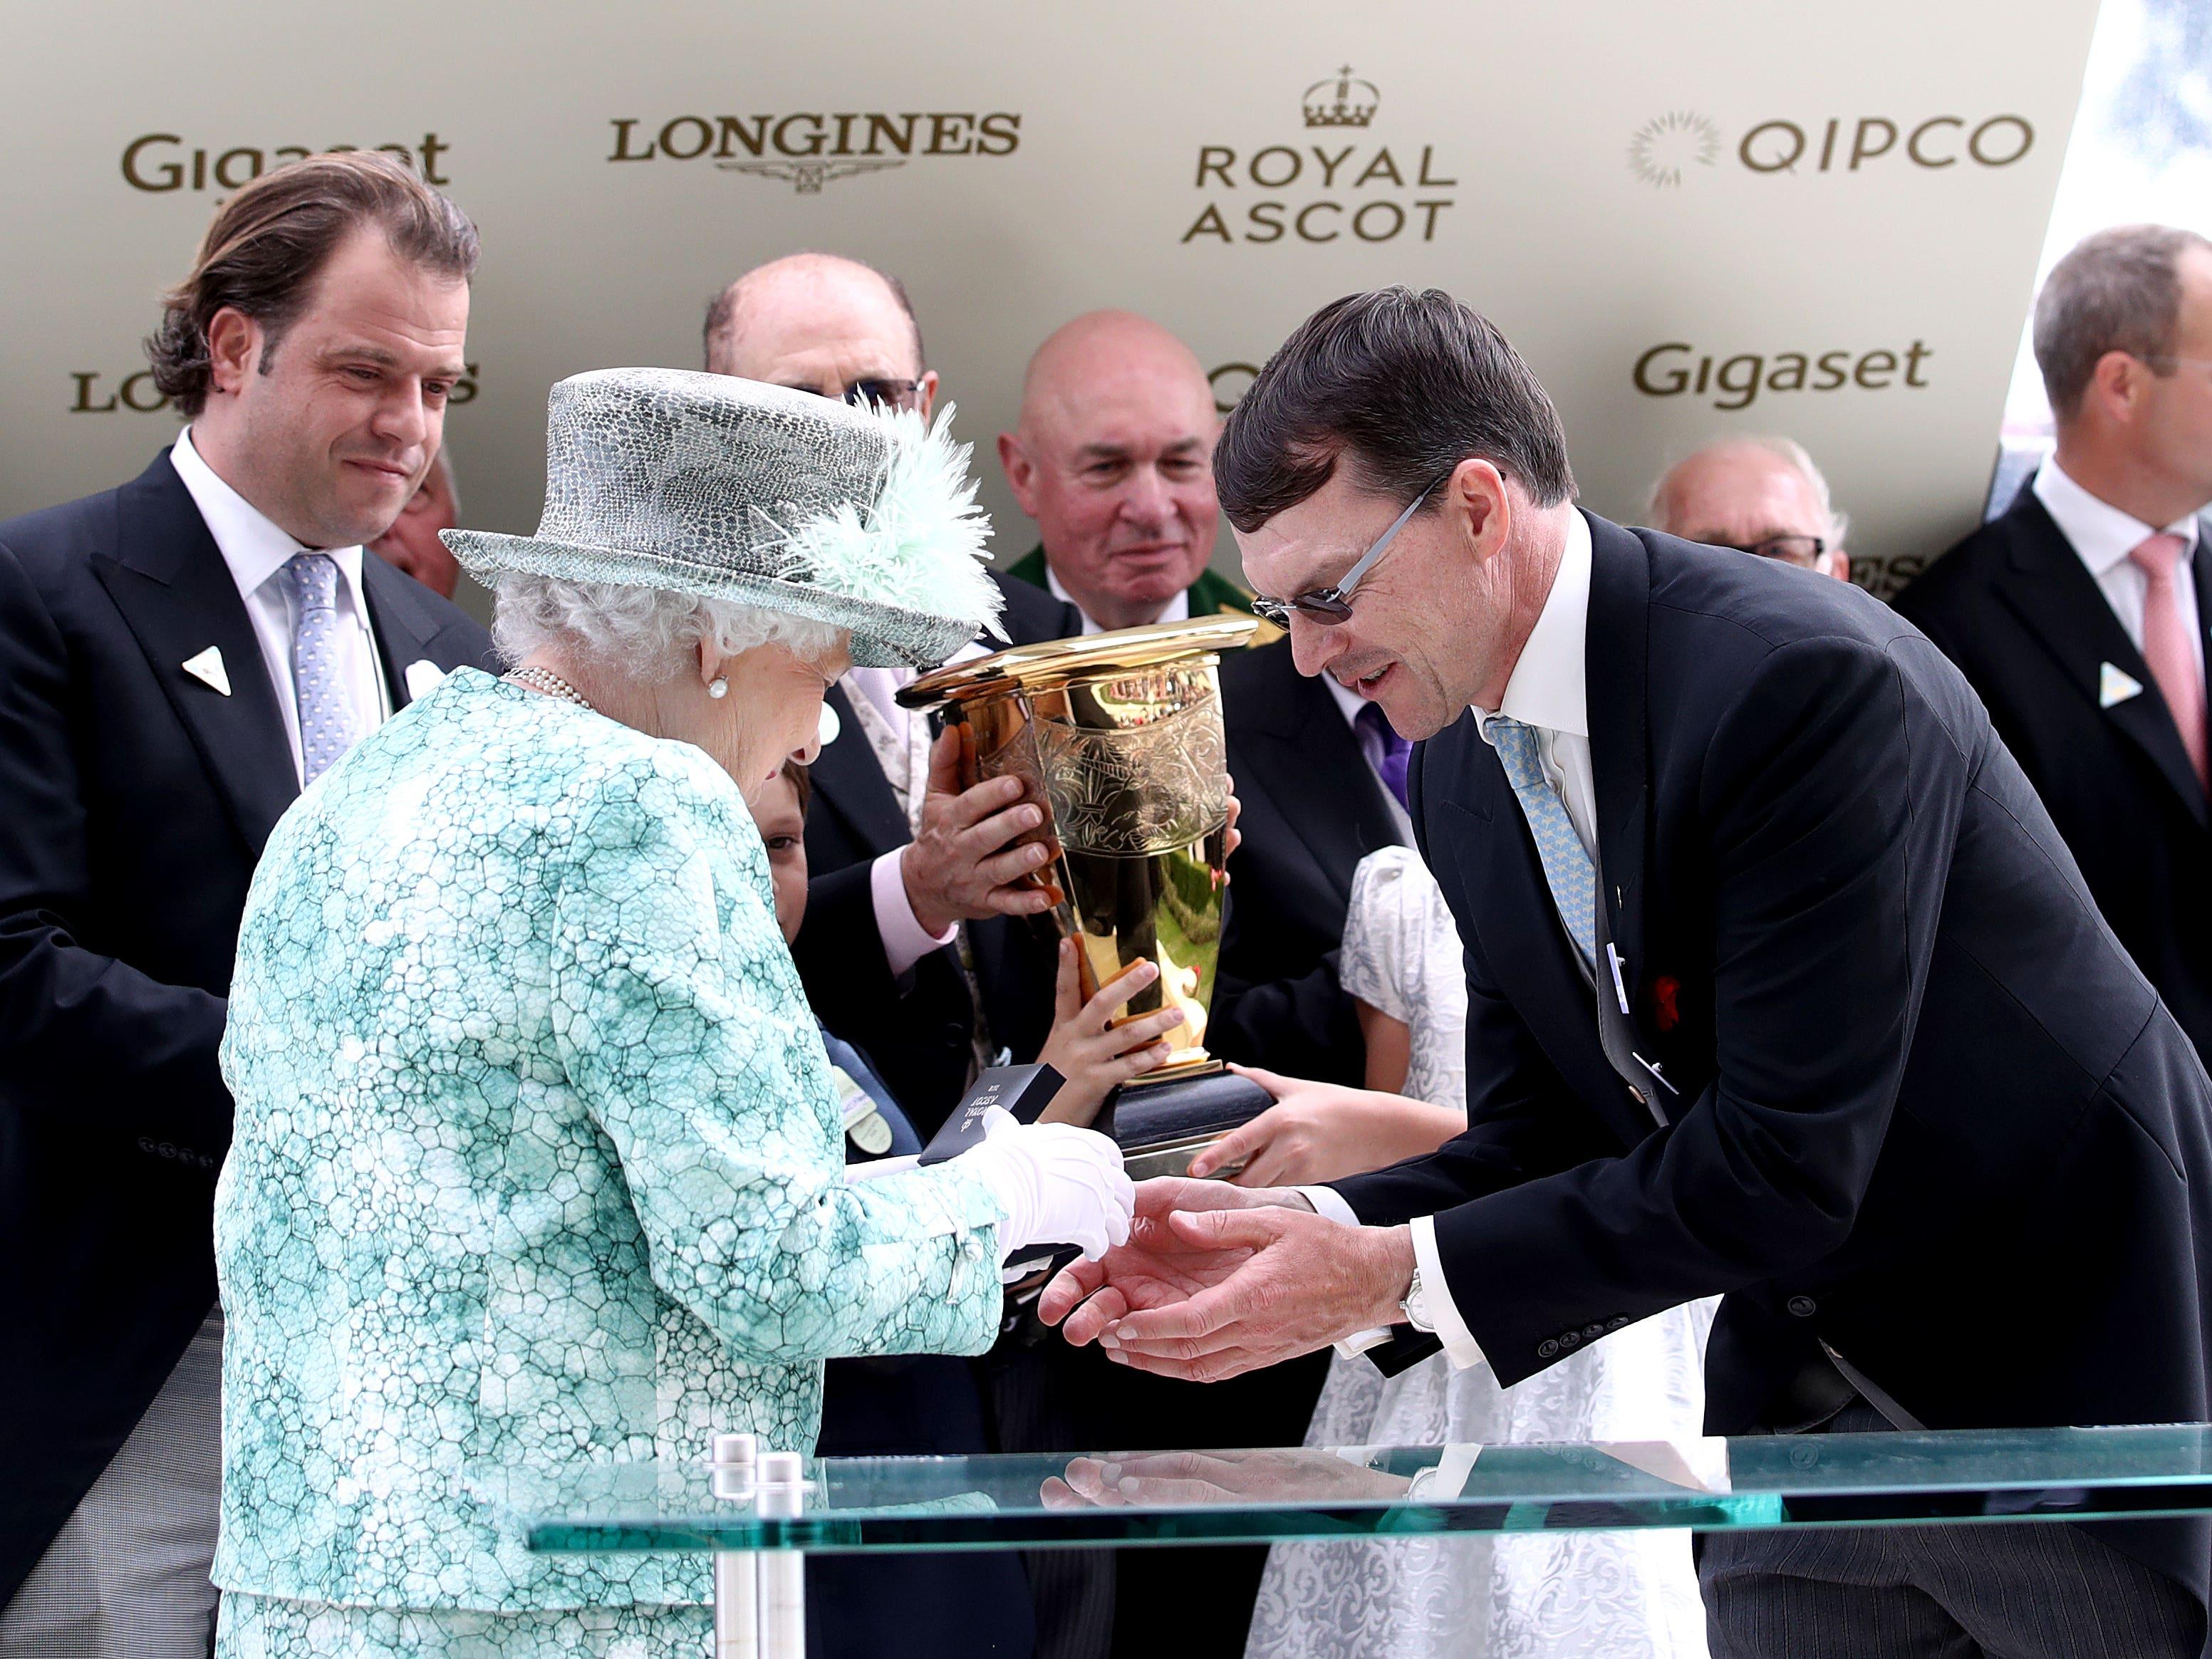 The Queen presents a momento to Aidan O'Brien after Merchant Navy wins the Diamond Jubilee Stakes (John Walton/PA )